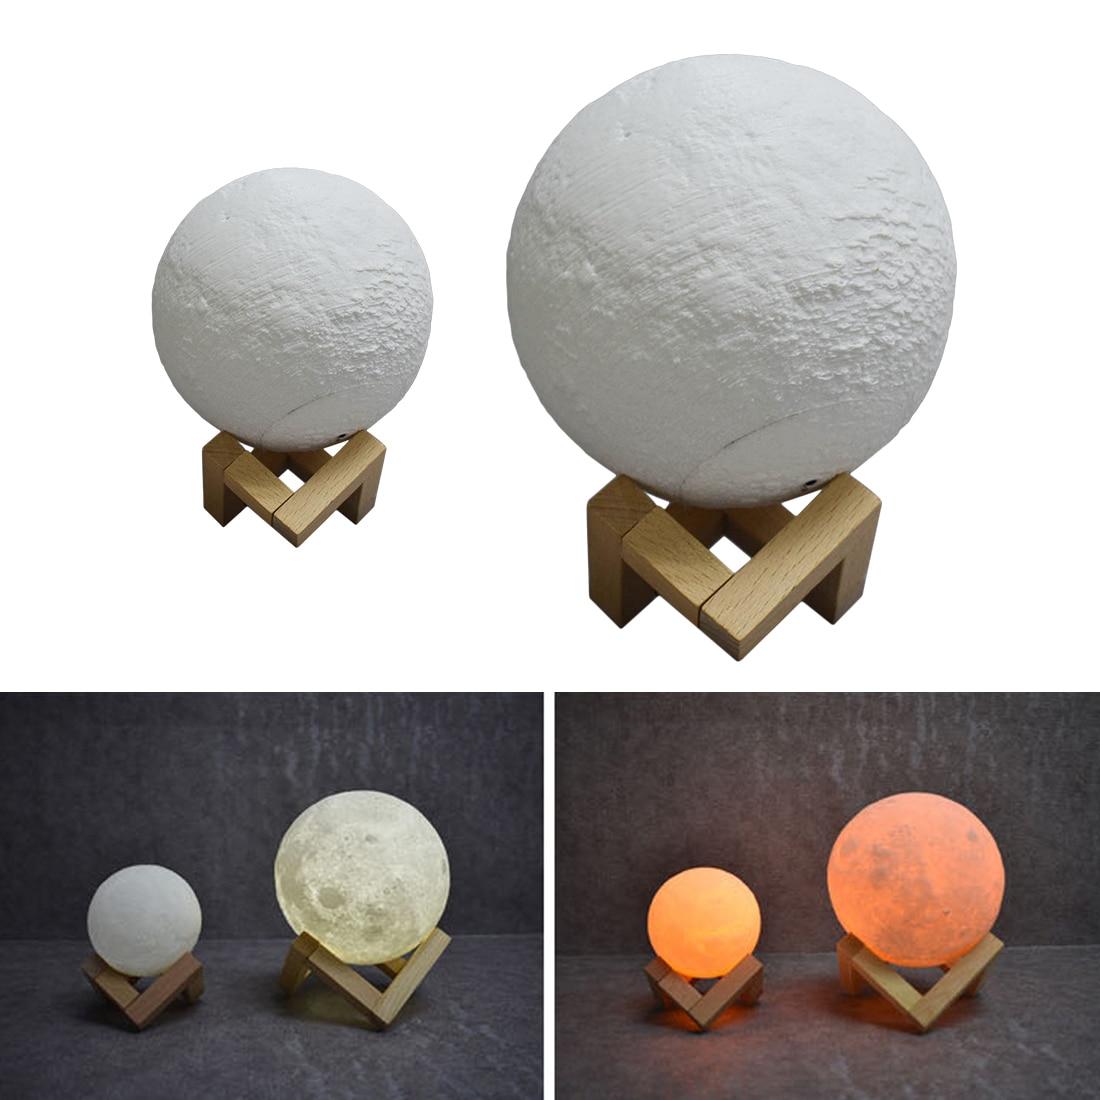 Diameter 3D Print Moon Lamp USB LED Night Light Lamp Moonlight Gift Touch Sensor Color Changing Bedroom Decor 8cm 15cm